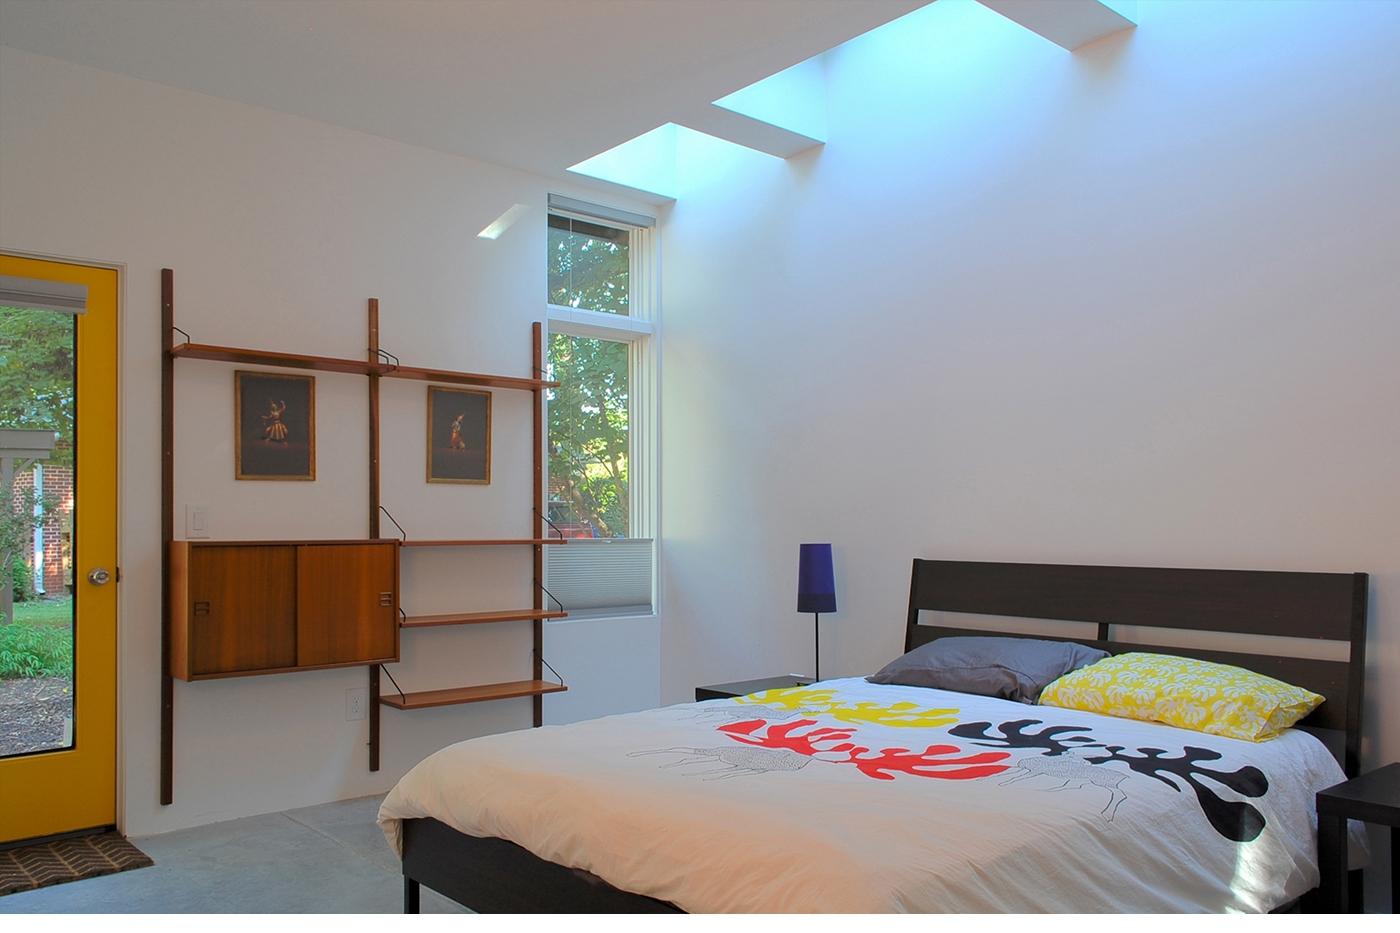 01-CUBE-Carrboro-bedroom.jpg